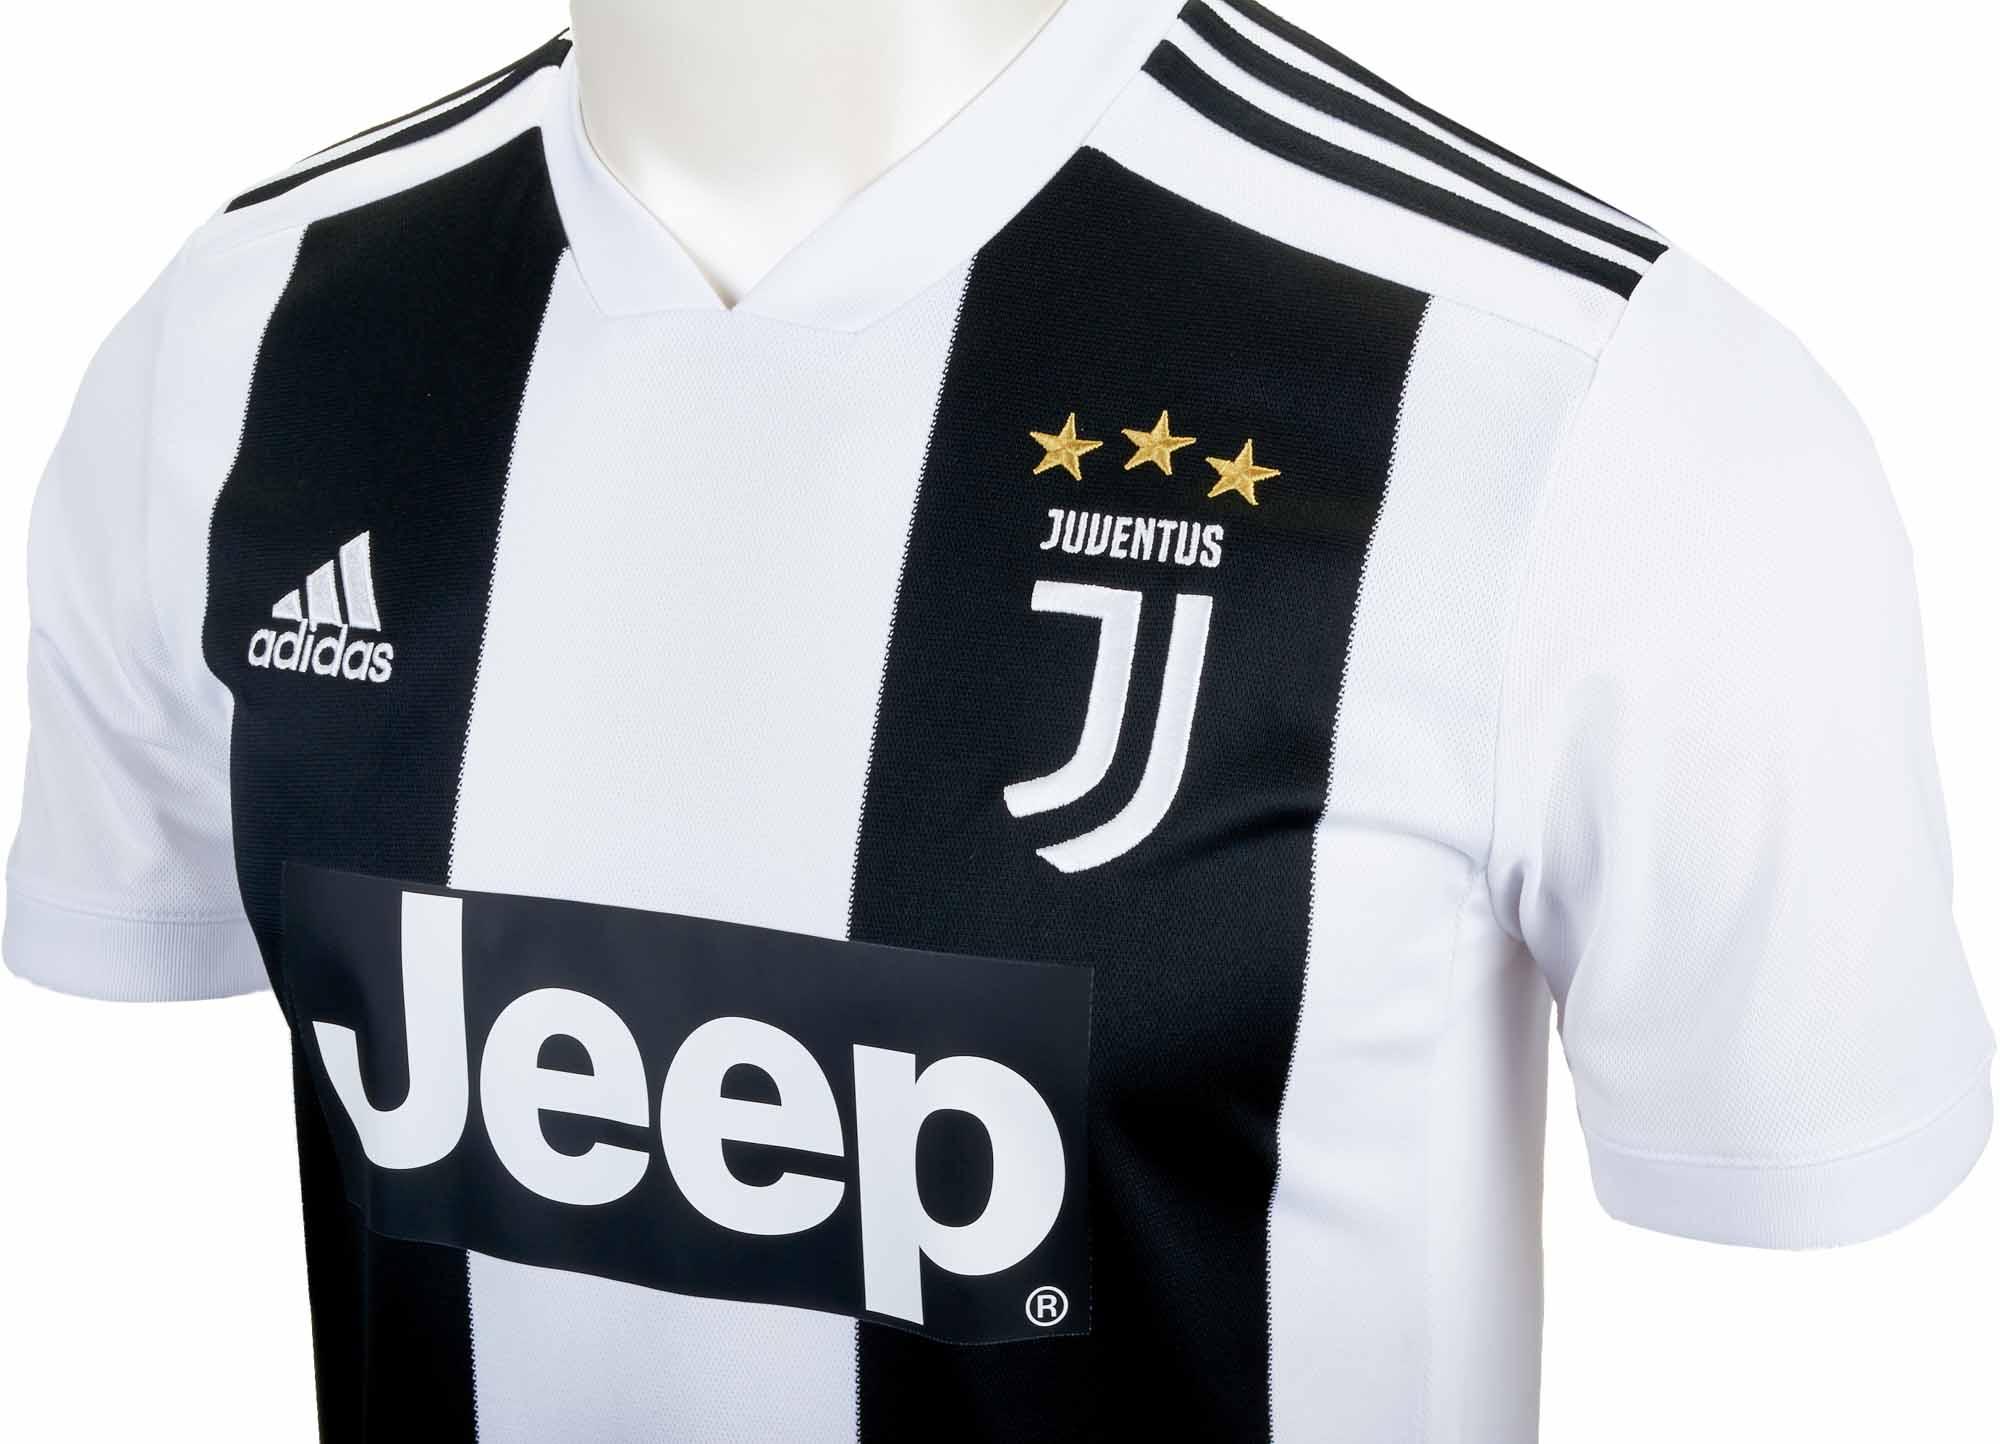 half off fce21 d2665 adidas Cristiano Ronaldo Juventus Home Jersey 2018-19 ...